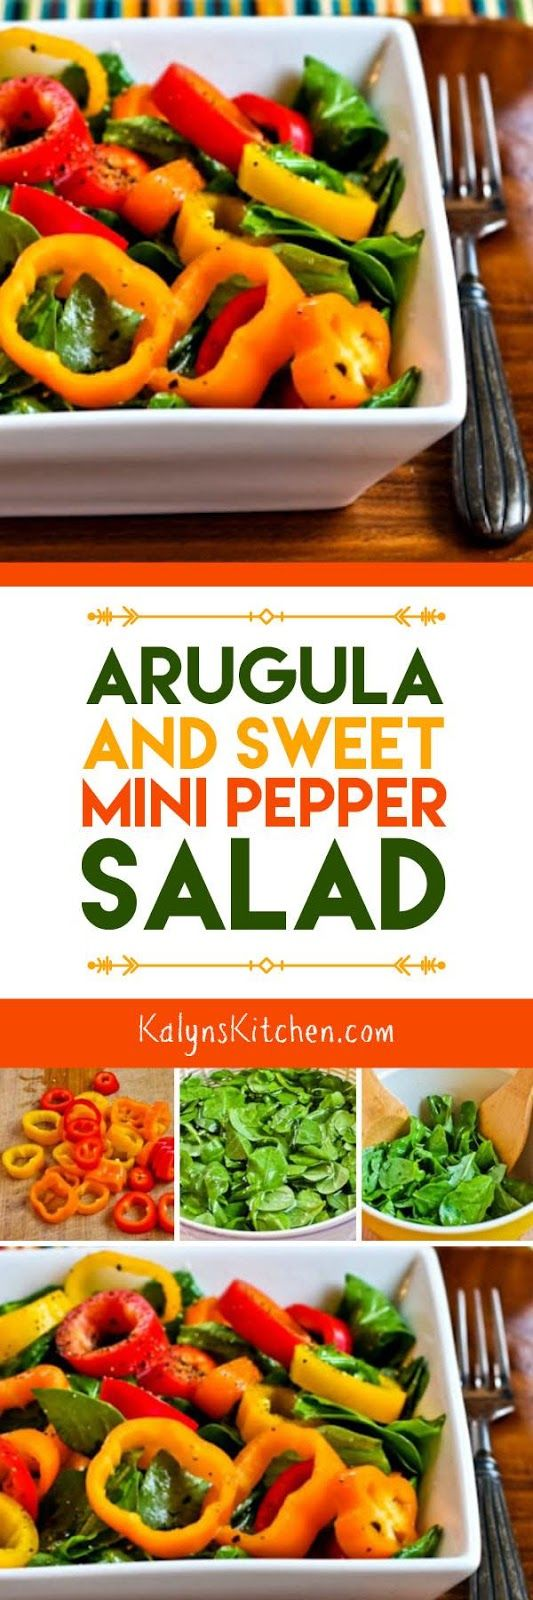 Arugula and Sweet Mini Pepper Salad found on KalynsKitchen.com.